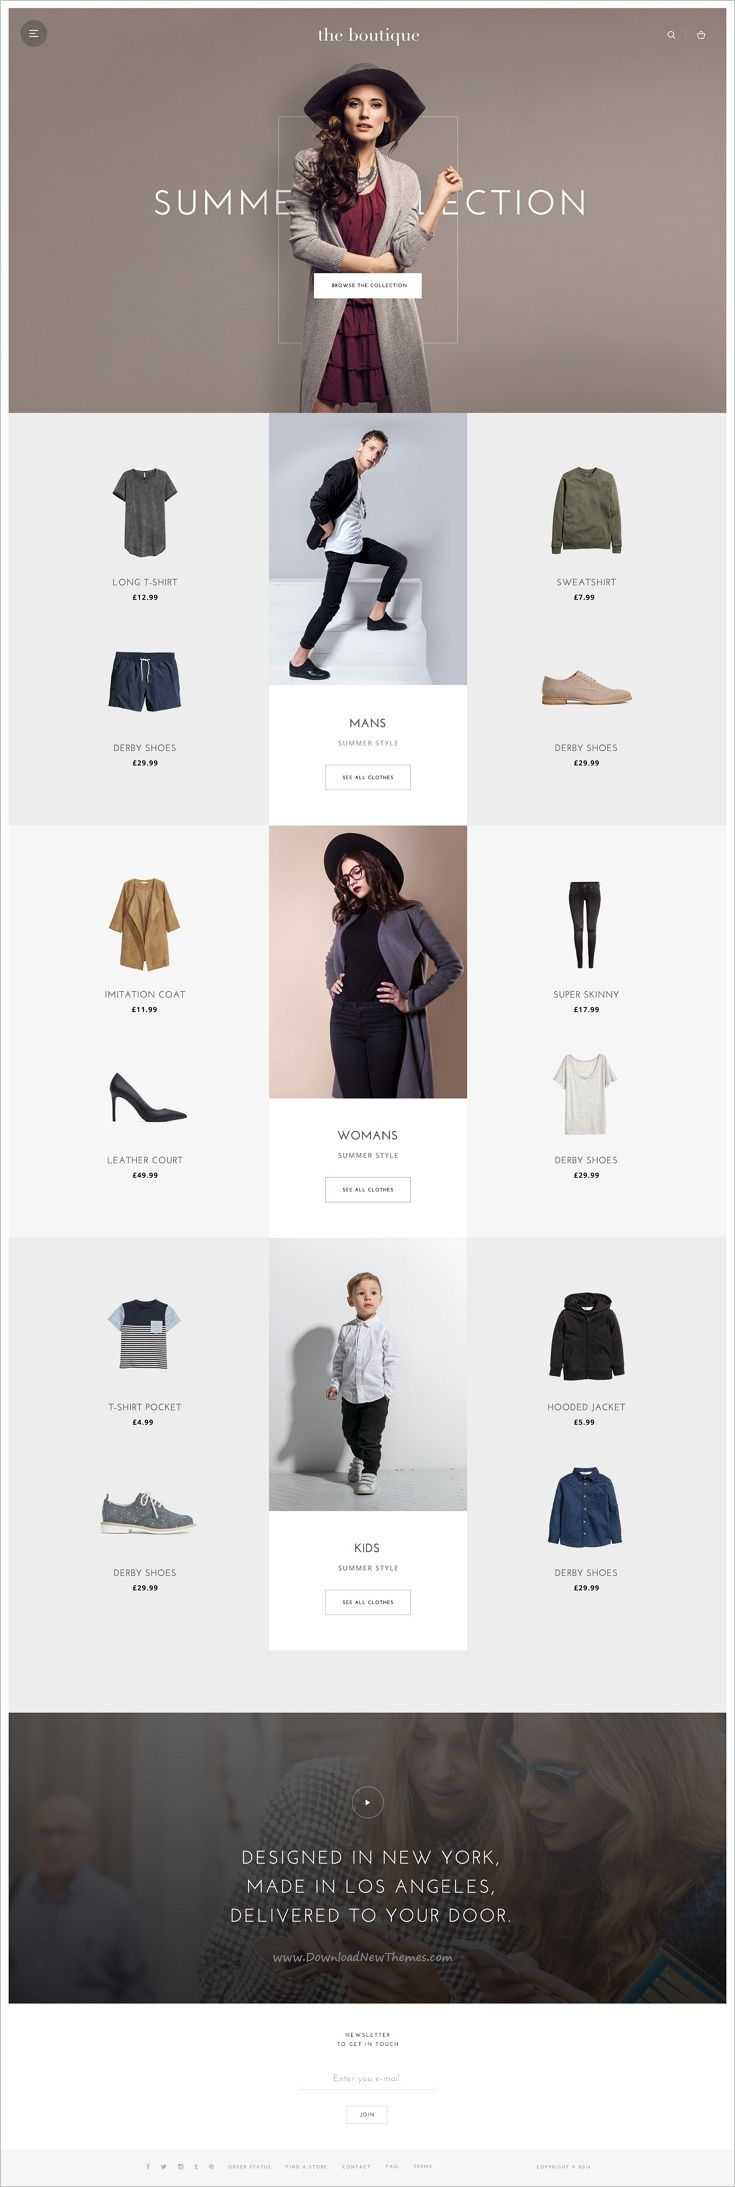 Floris is an award wining stunning #PSD template for #minimalist #boutique shop eCommerce website download now➩ https://themeforest.net/item/floris-trendy-ecommerce-psd-template/18415910?ref=Datasata